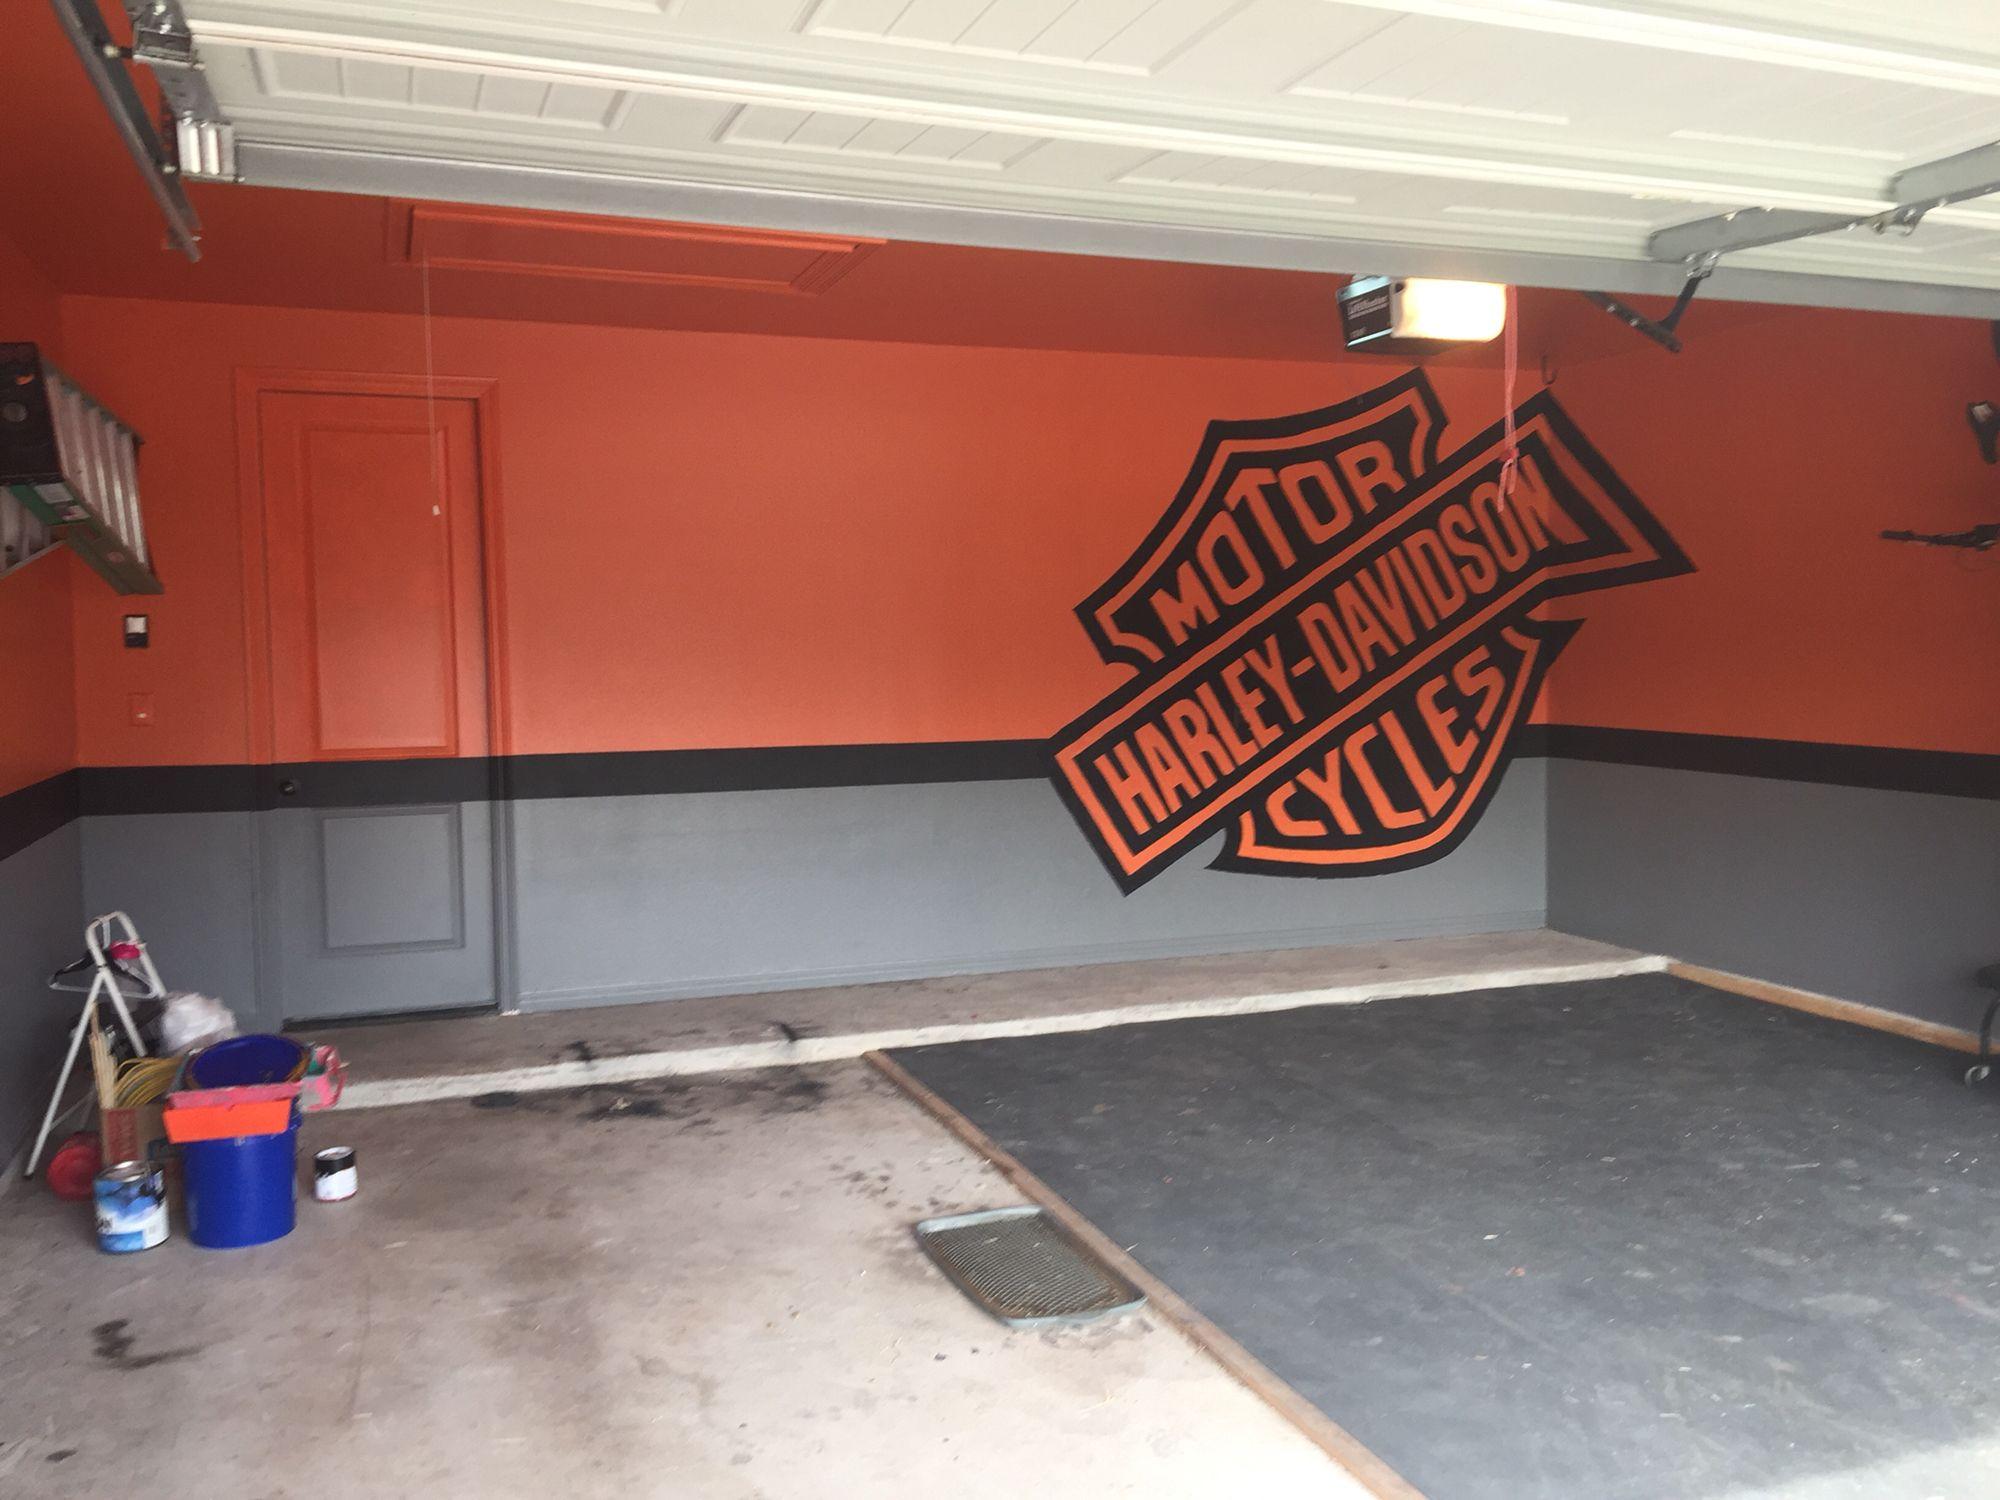 Harley Davidson Garage Garage Makeover Harley Davidson Decor Man Garage